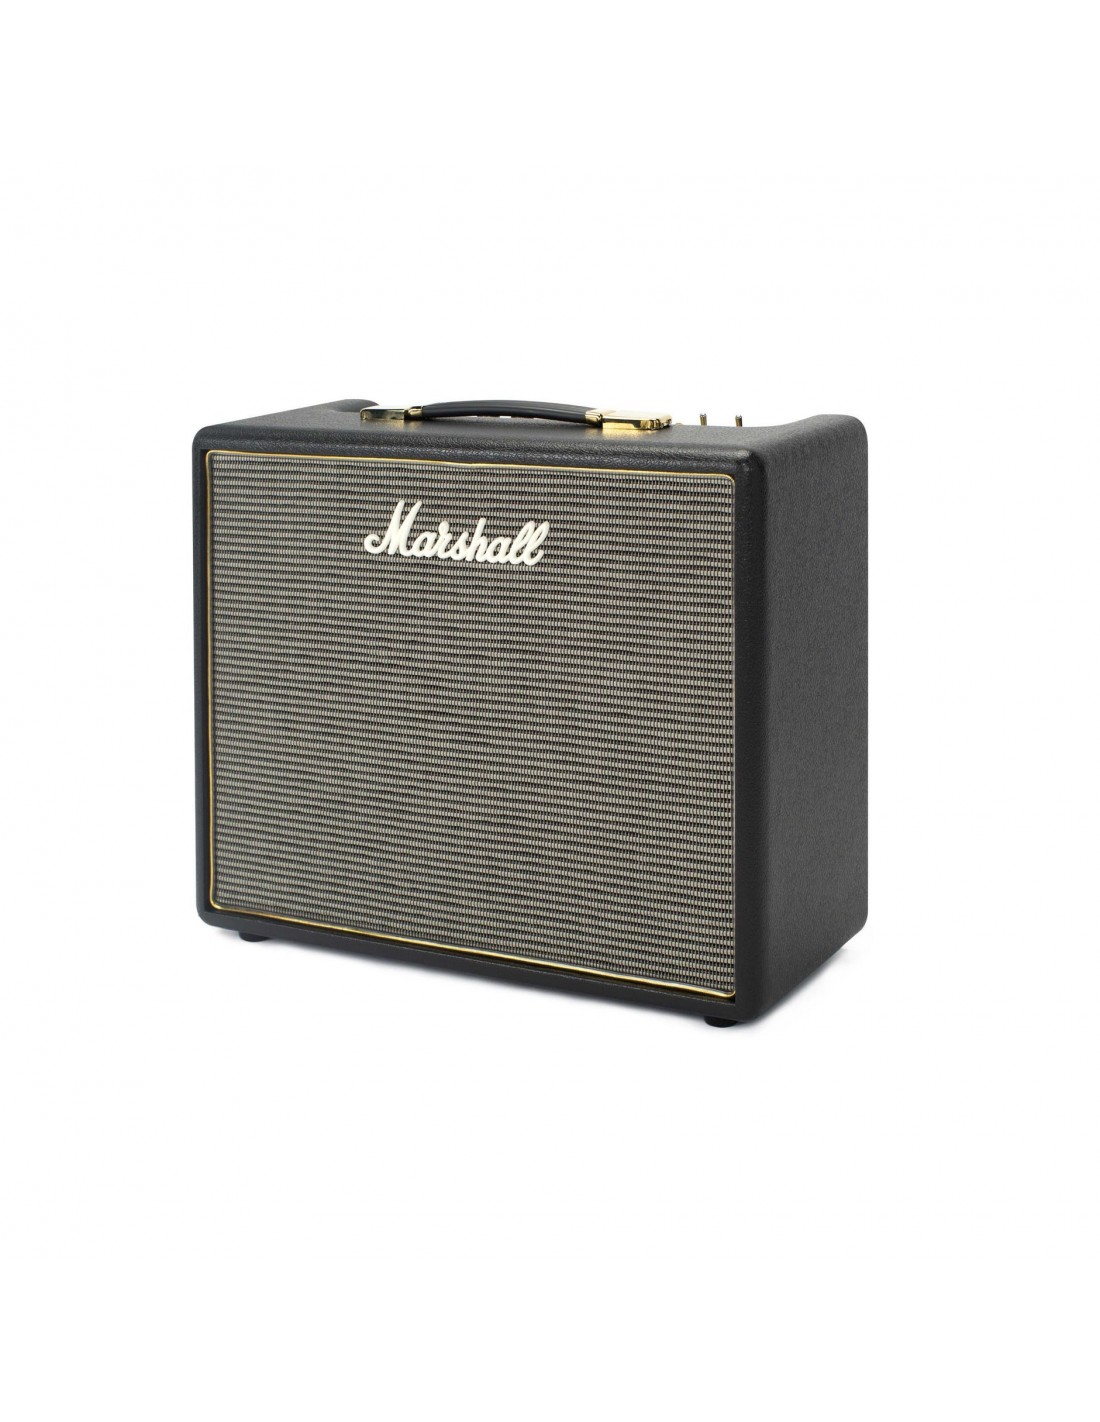 marshall origin 5c combo valve electric guitar amplifier. Black Bedroom Furniture Sets. Home Design Ideas